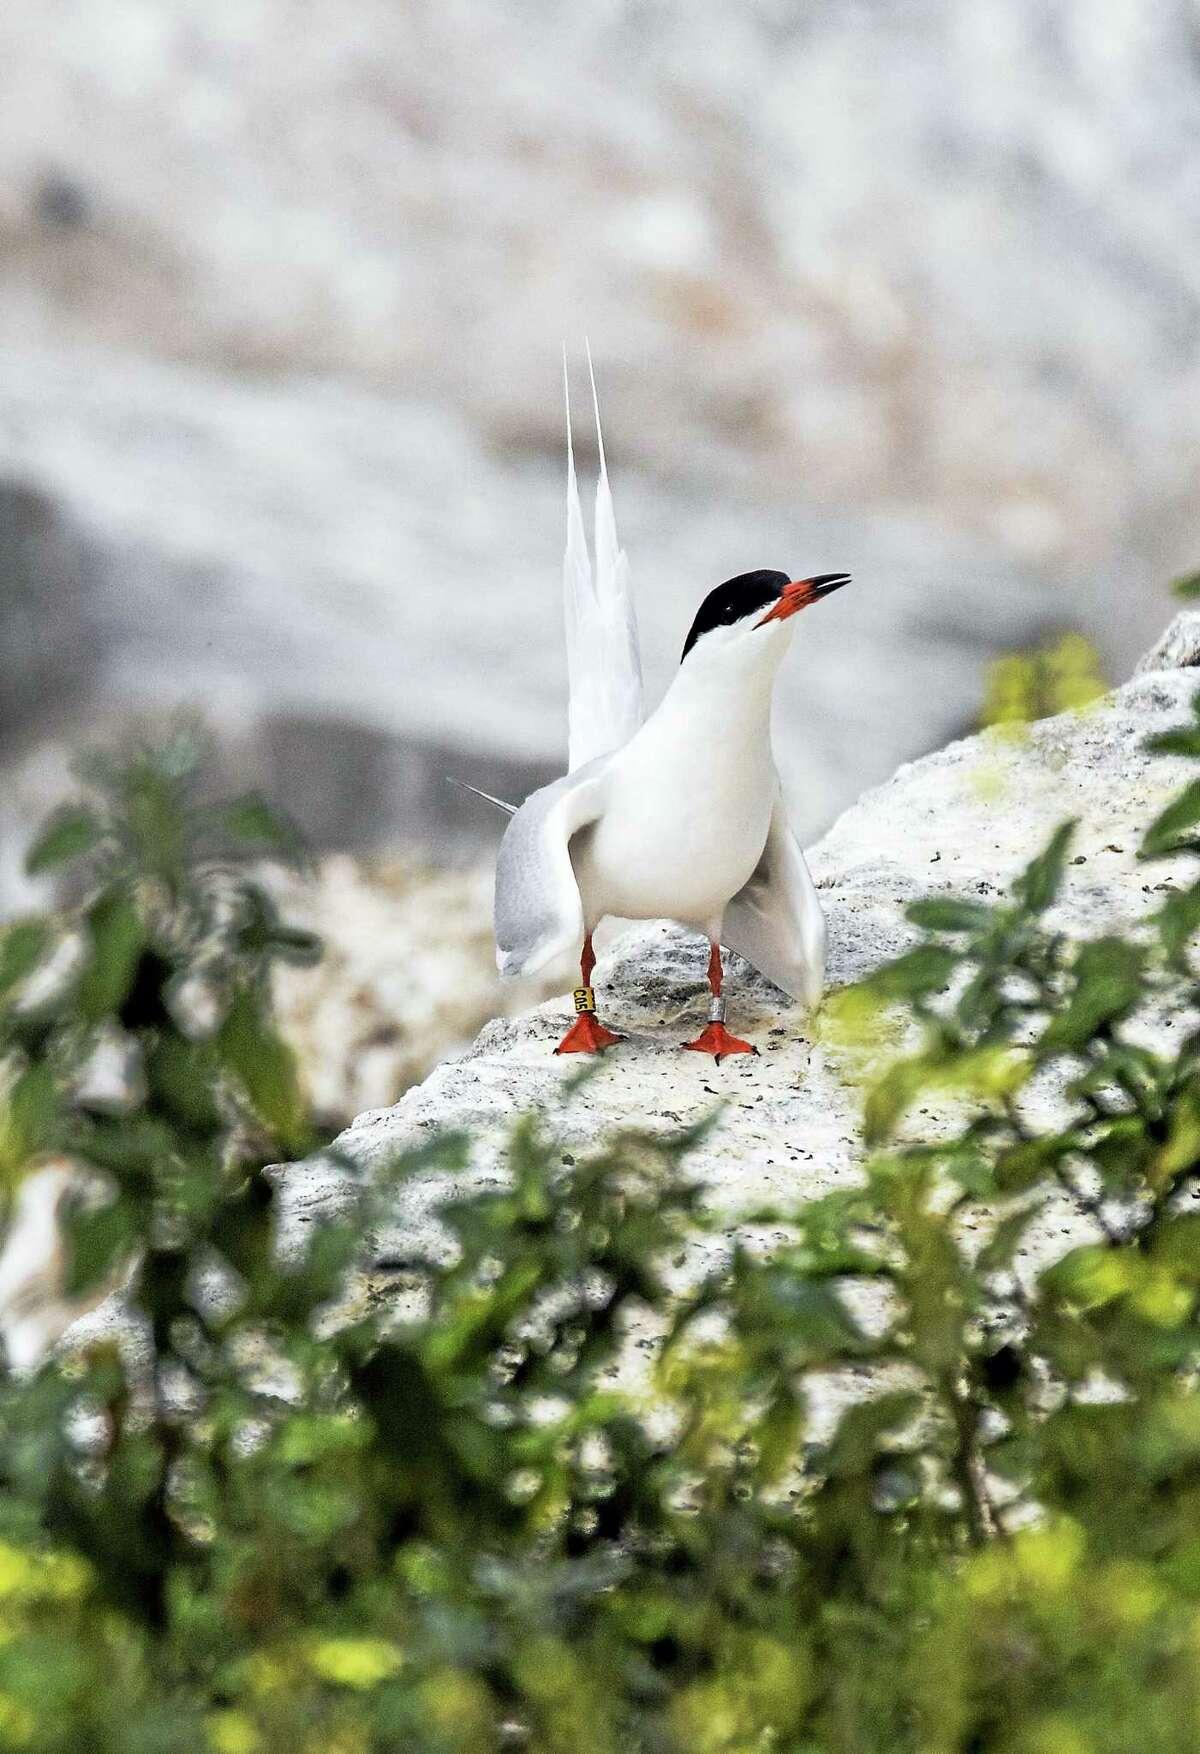 A Roseate tern at Gull Island seems unaware of camera